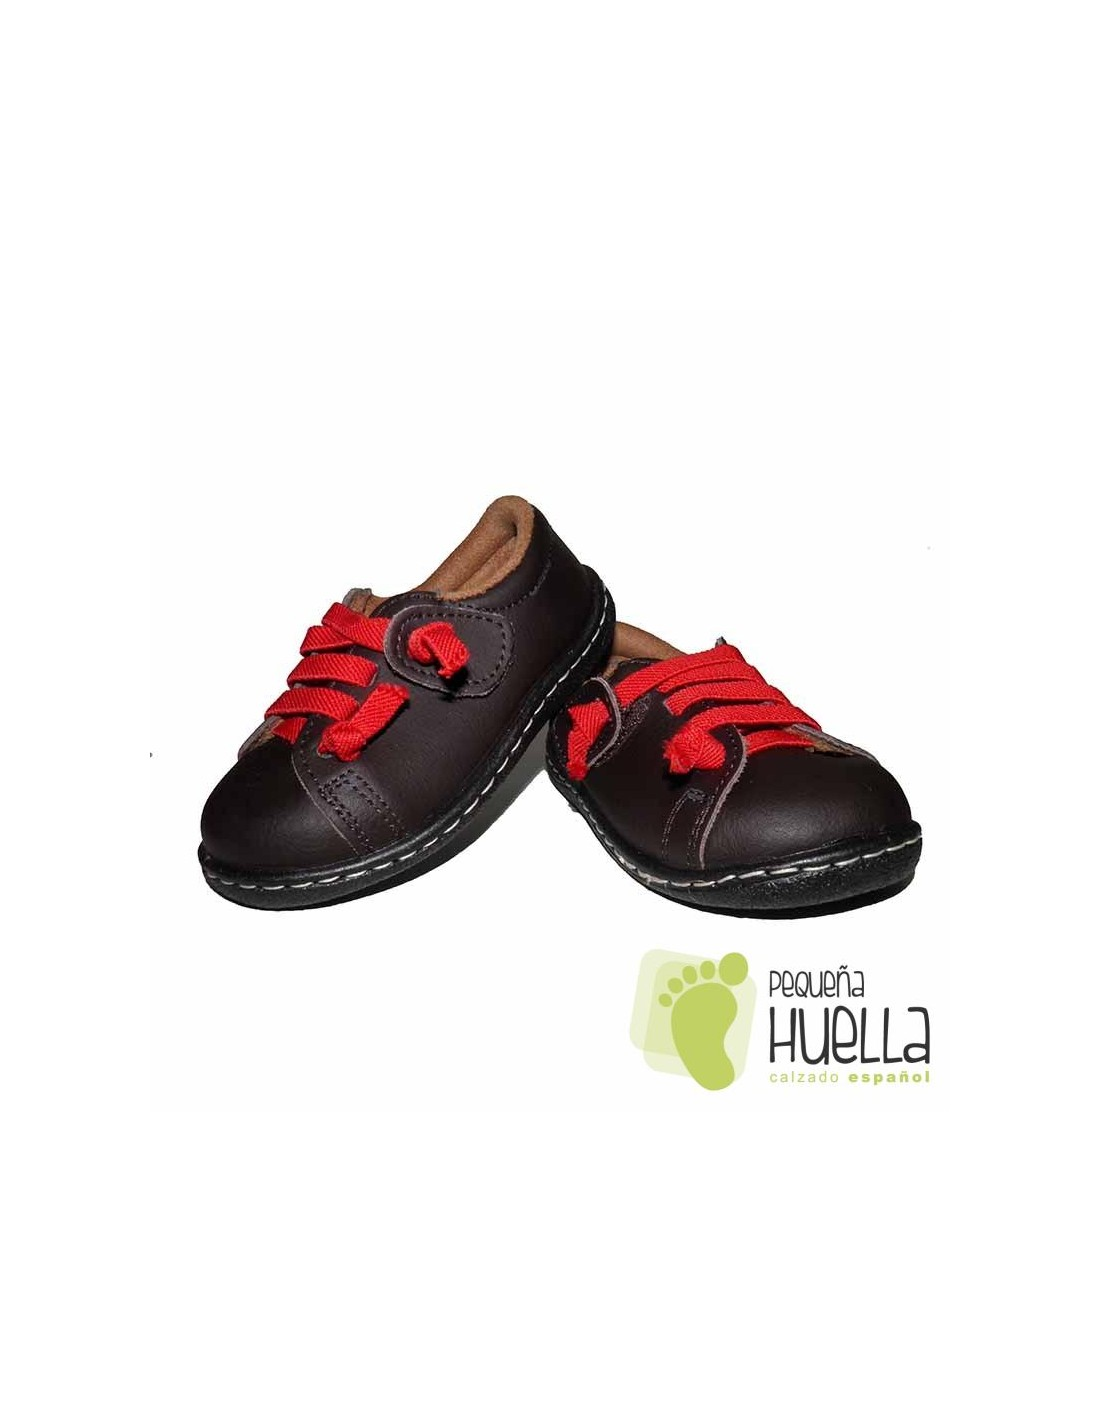 Trtfbxw Para Comprar Camper Zapato Mini De Velcro Online Niño H8qg6dw